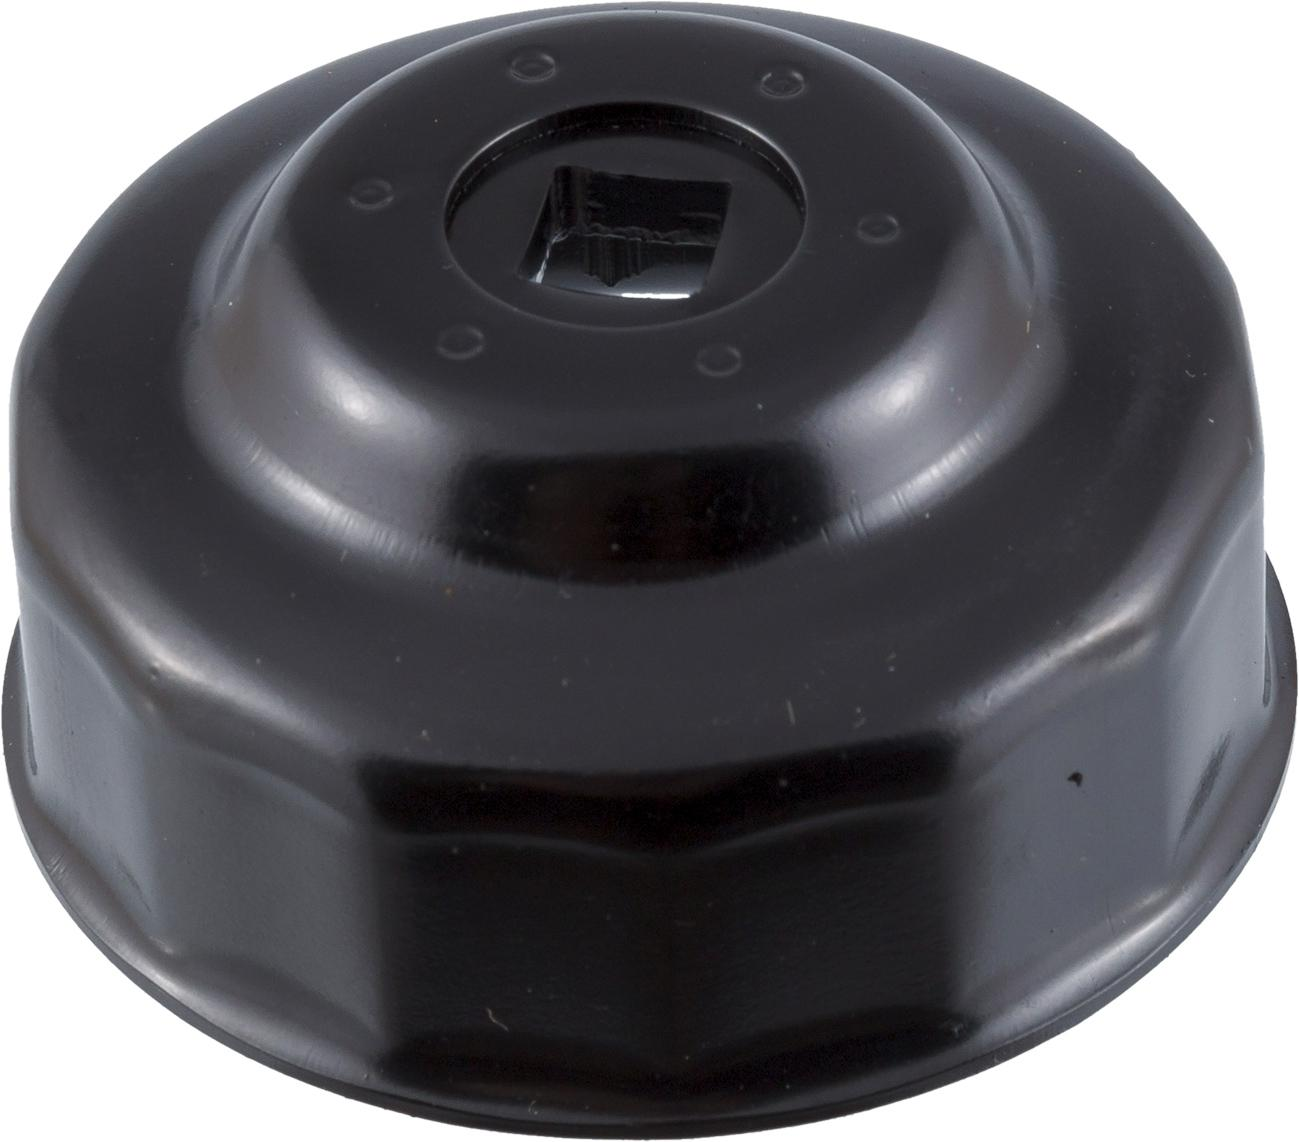 Съемник СТАНКОИМПОРТ Ka-65/14 набор зажимов резиновых шлангов станкоимпорт ka 9023